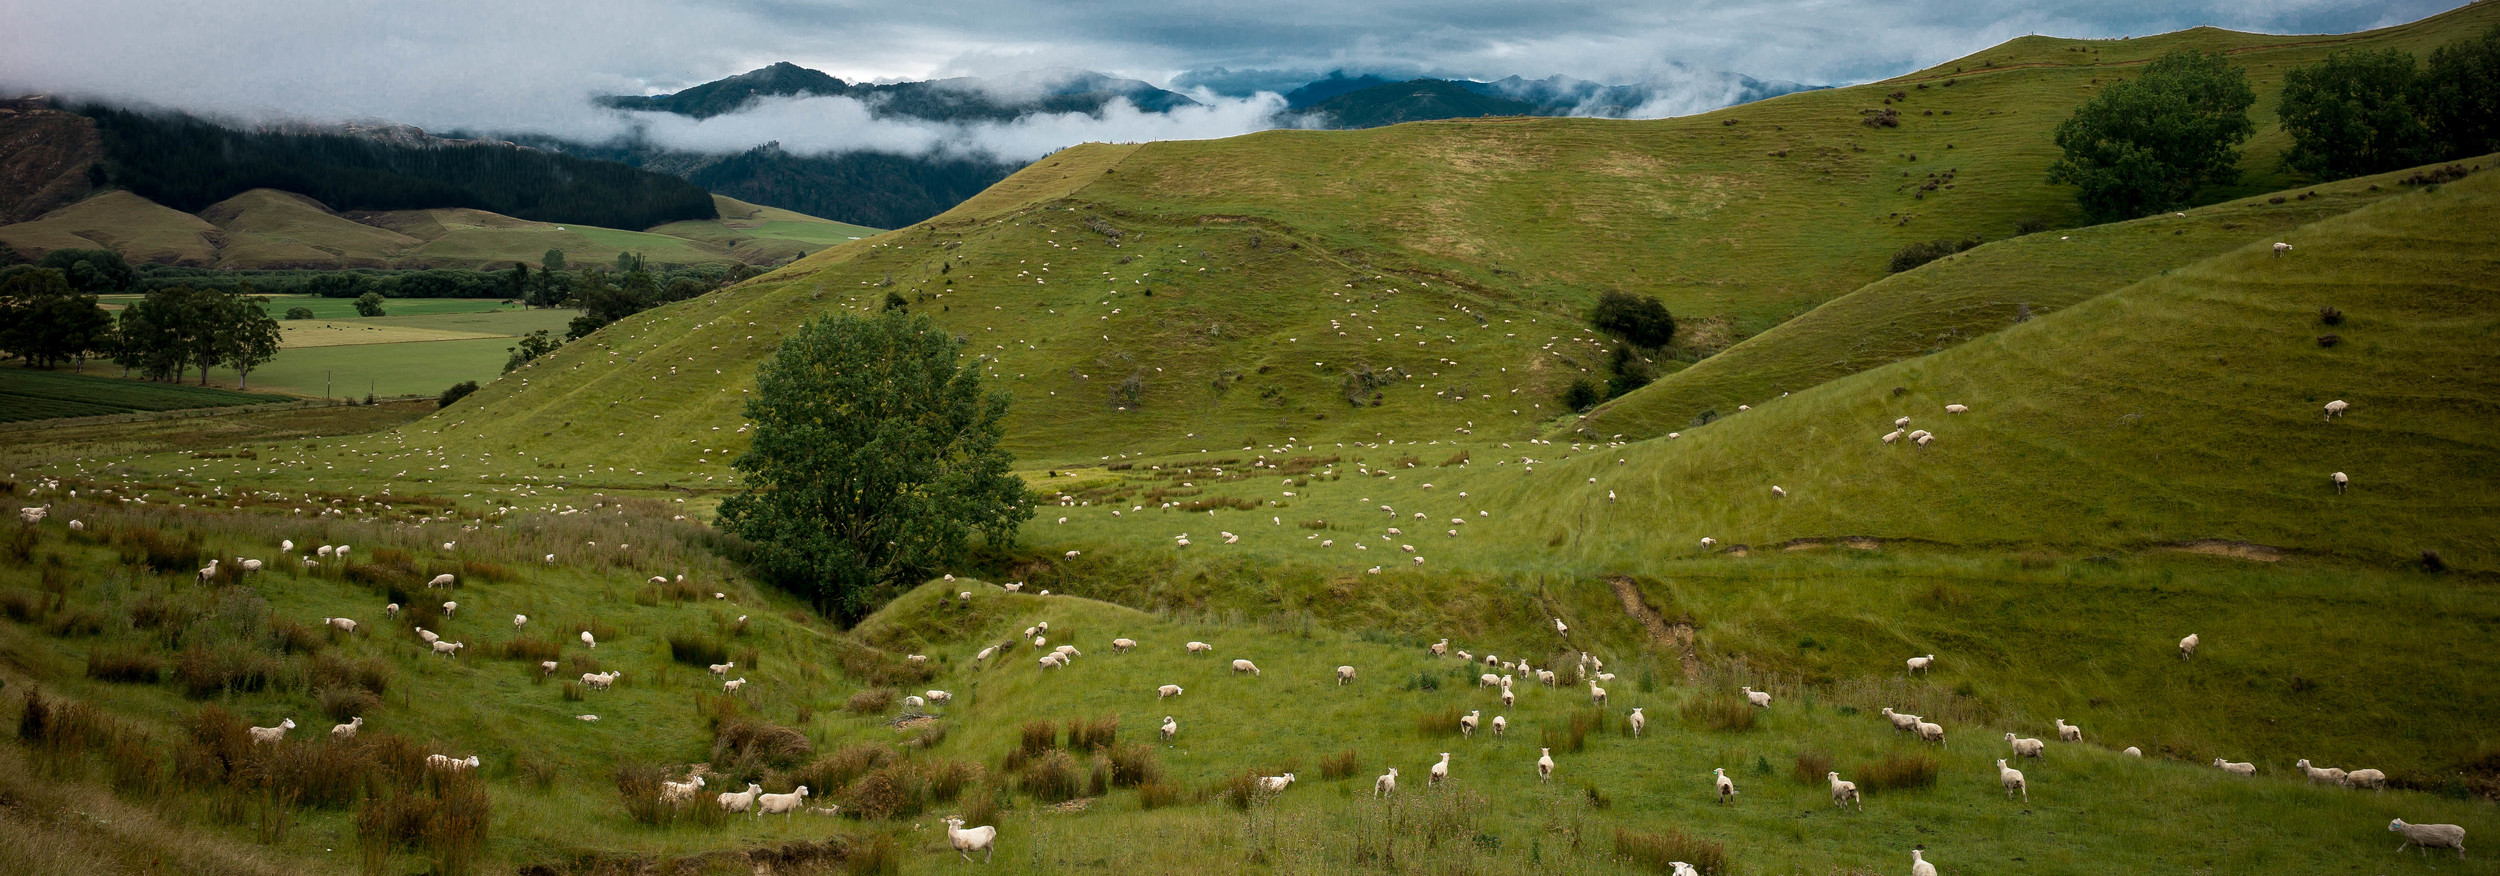 Sheep Sheep Everywhere